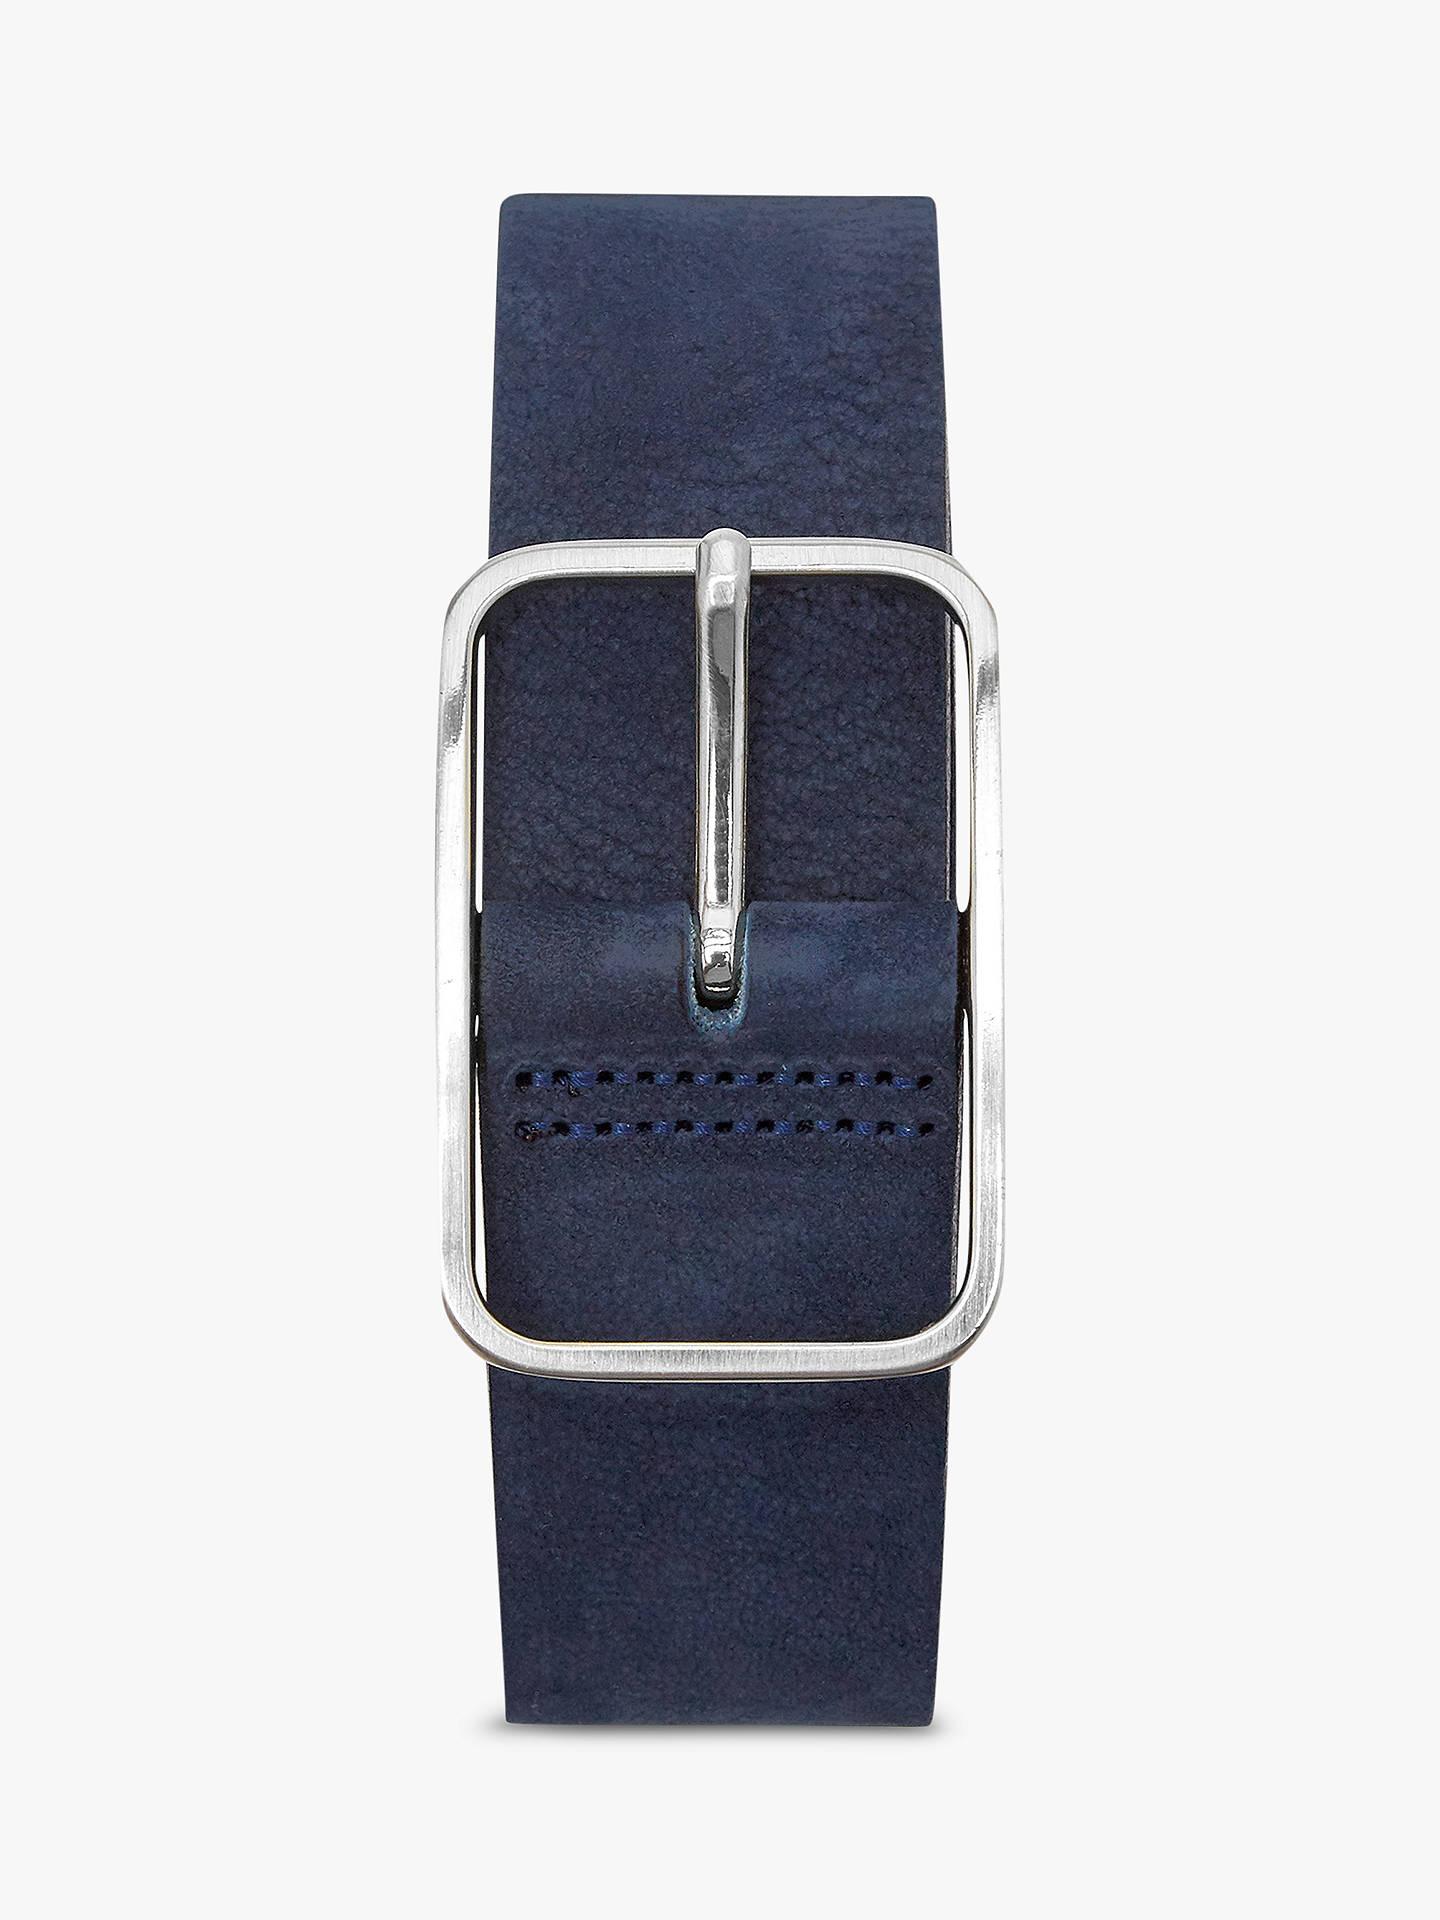 fdfee3da502c Ted Baker Escobar Bovine Leather Belt at John Lewis   Partners